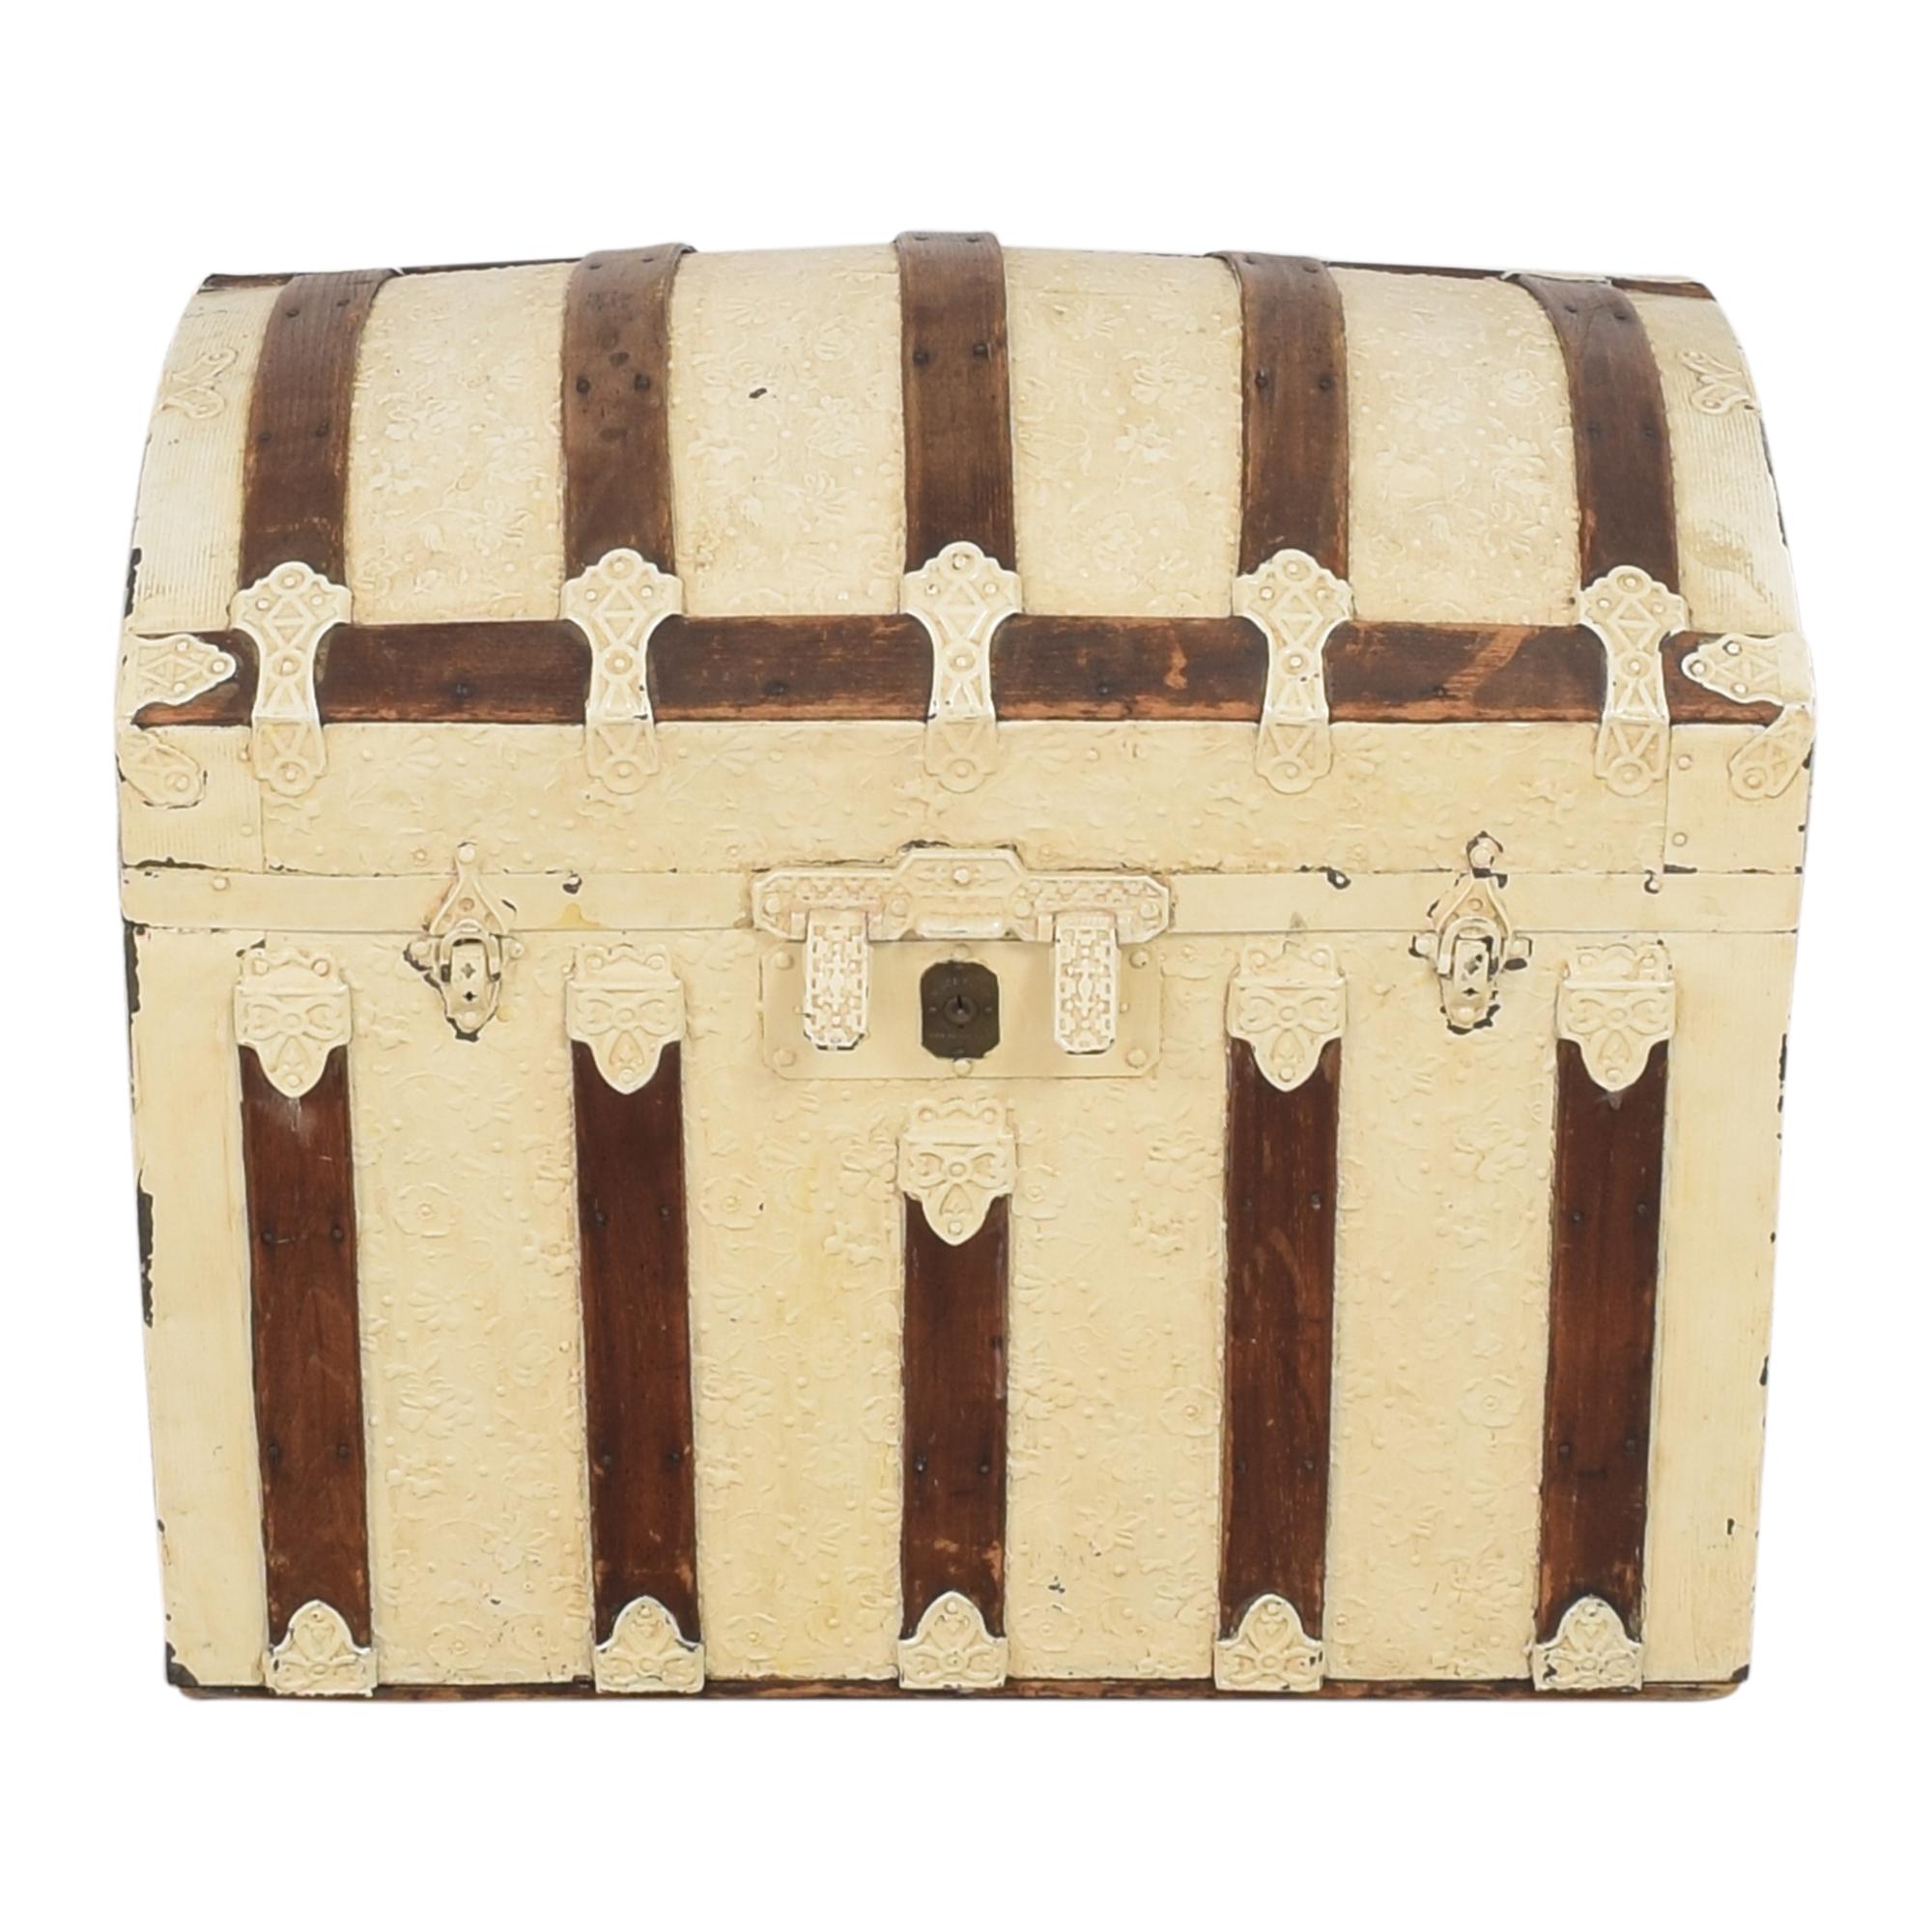 Vintage Trunk dimensions